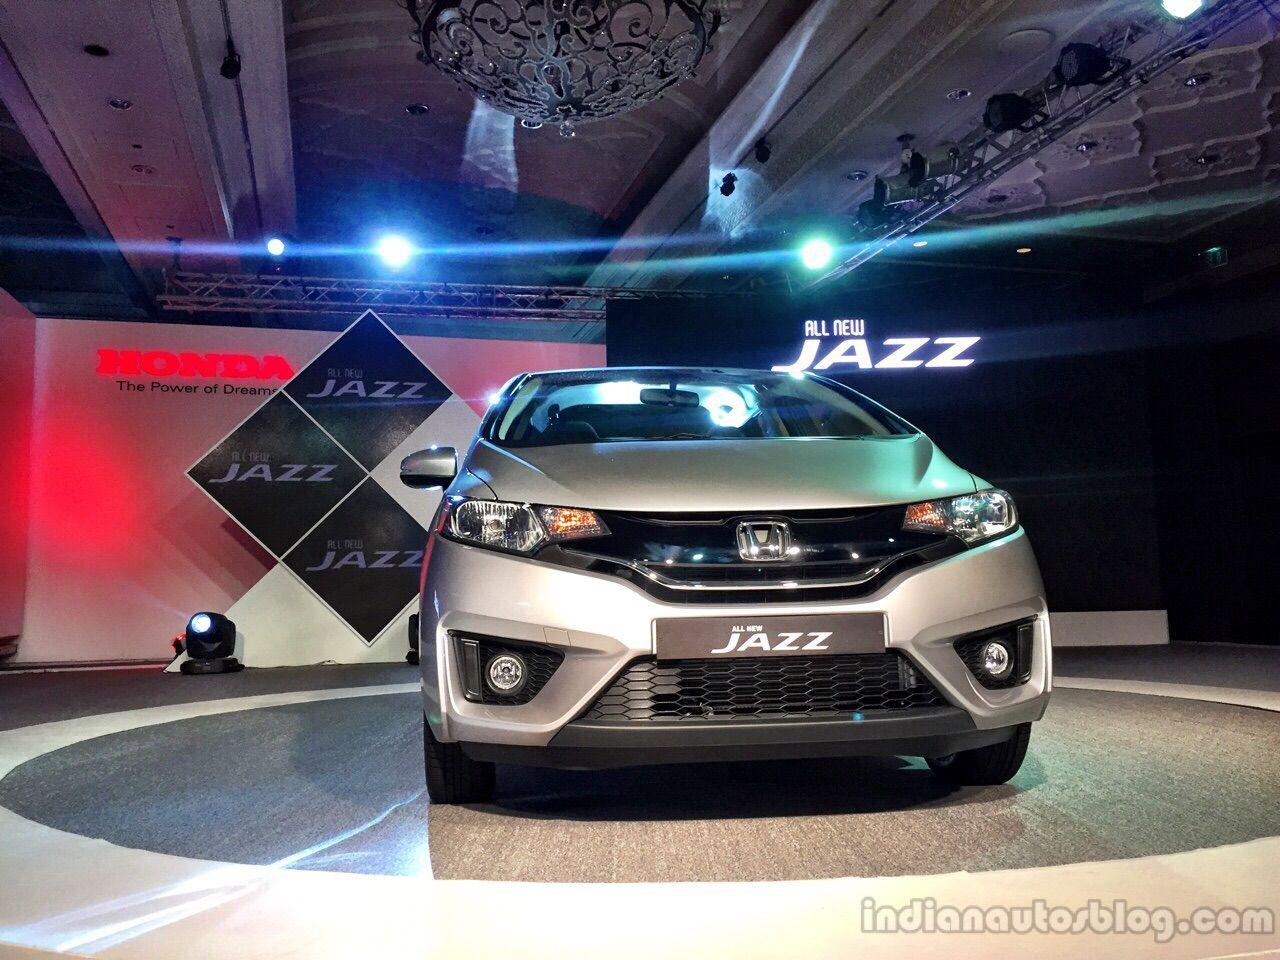 honda jazz won t get modulo or mugen kit in india will offer sporty accessories iab report http indianautosblog com 2015 06 honda jazz